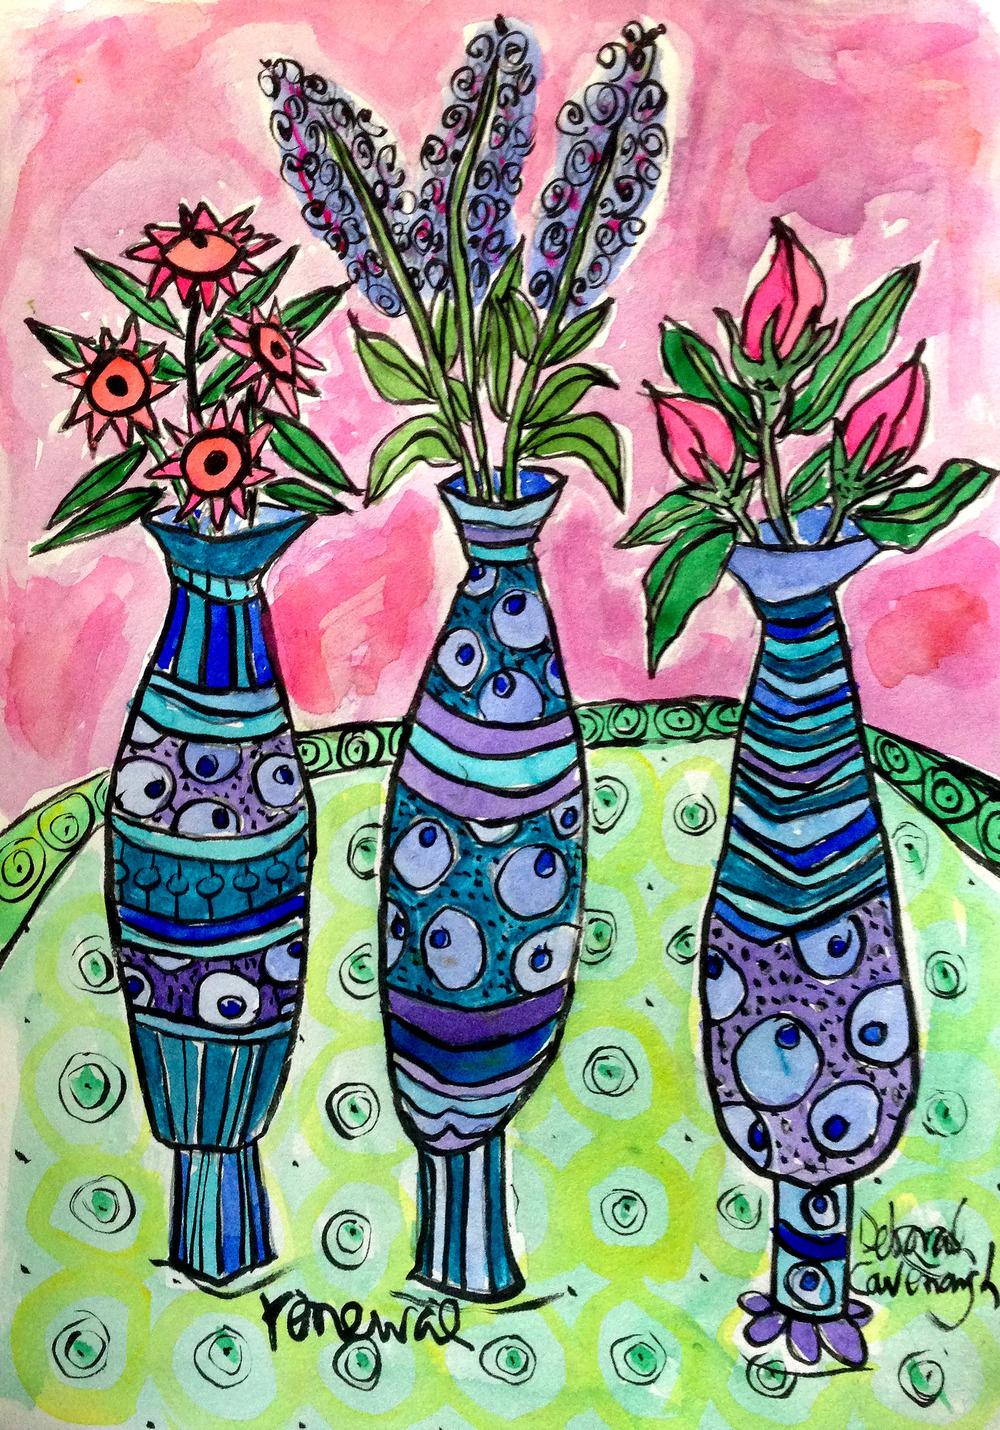 Renew watercolor artist magazine - Renewal_9x12 Jpg Renewal